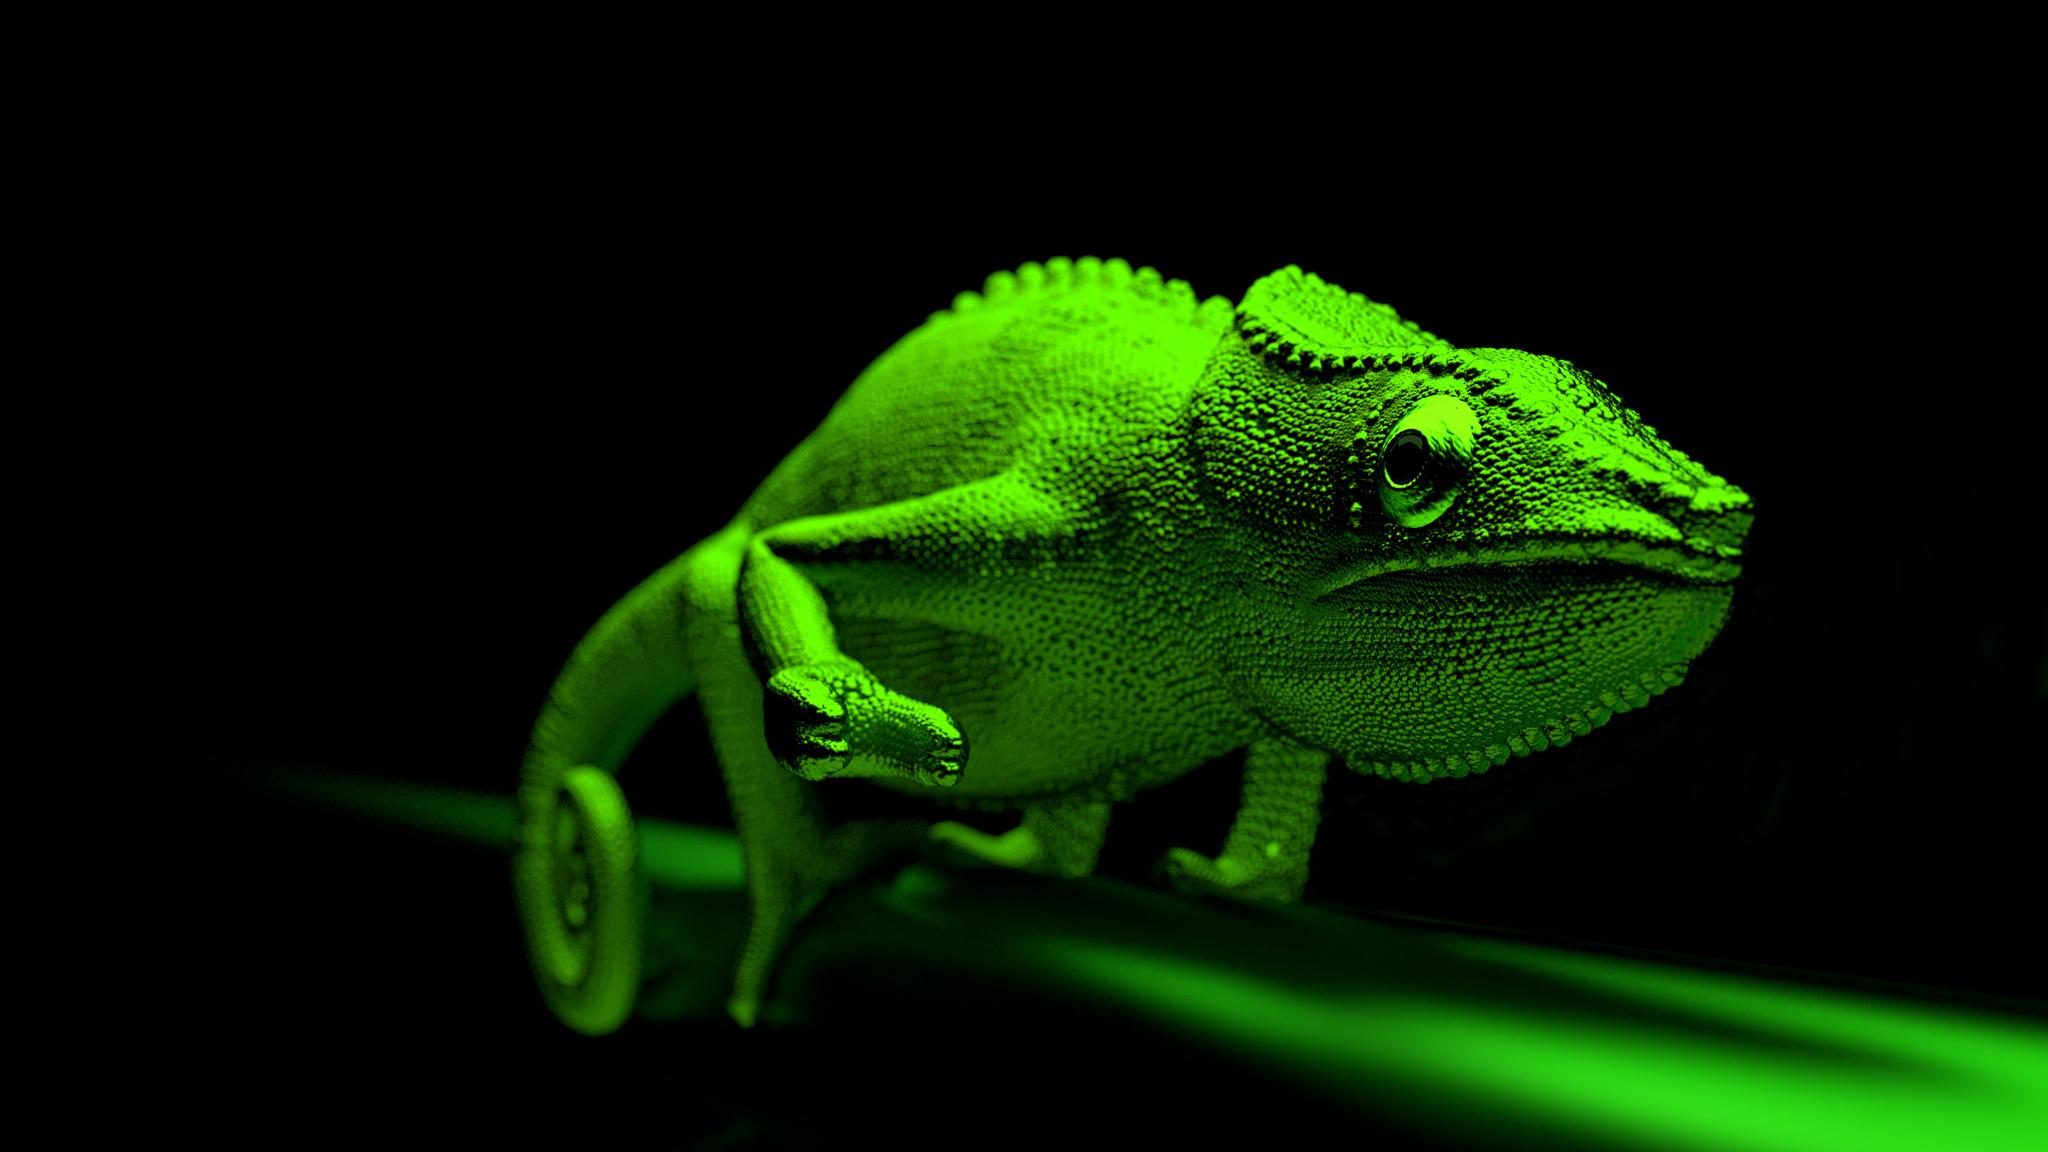 ящерица глаз lizard eyes на телефон